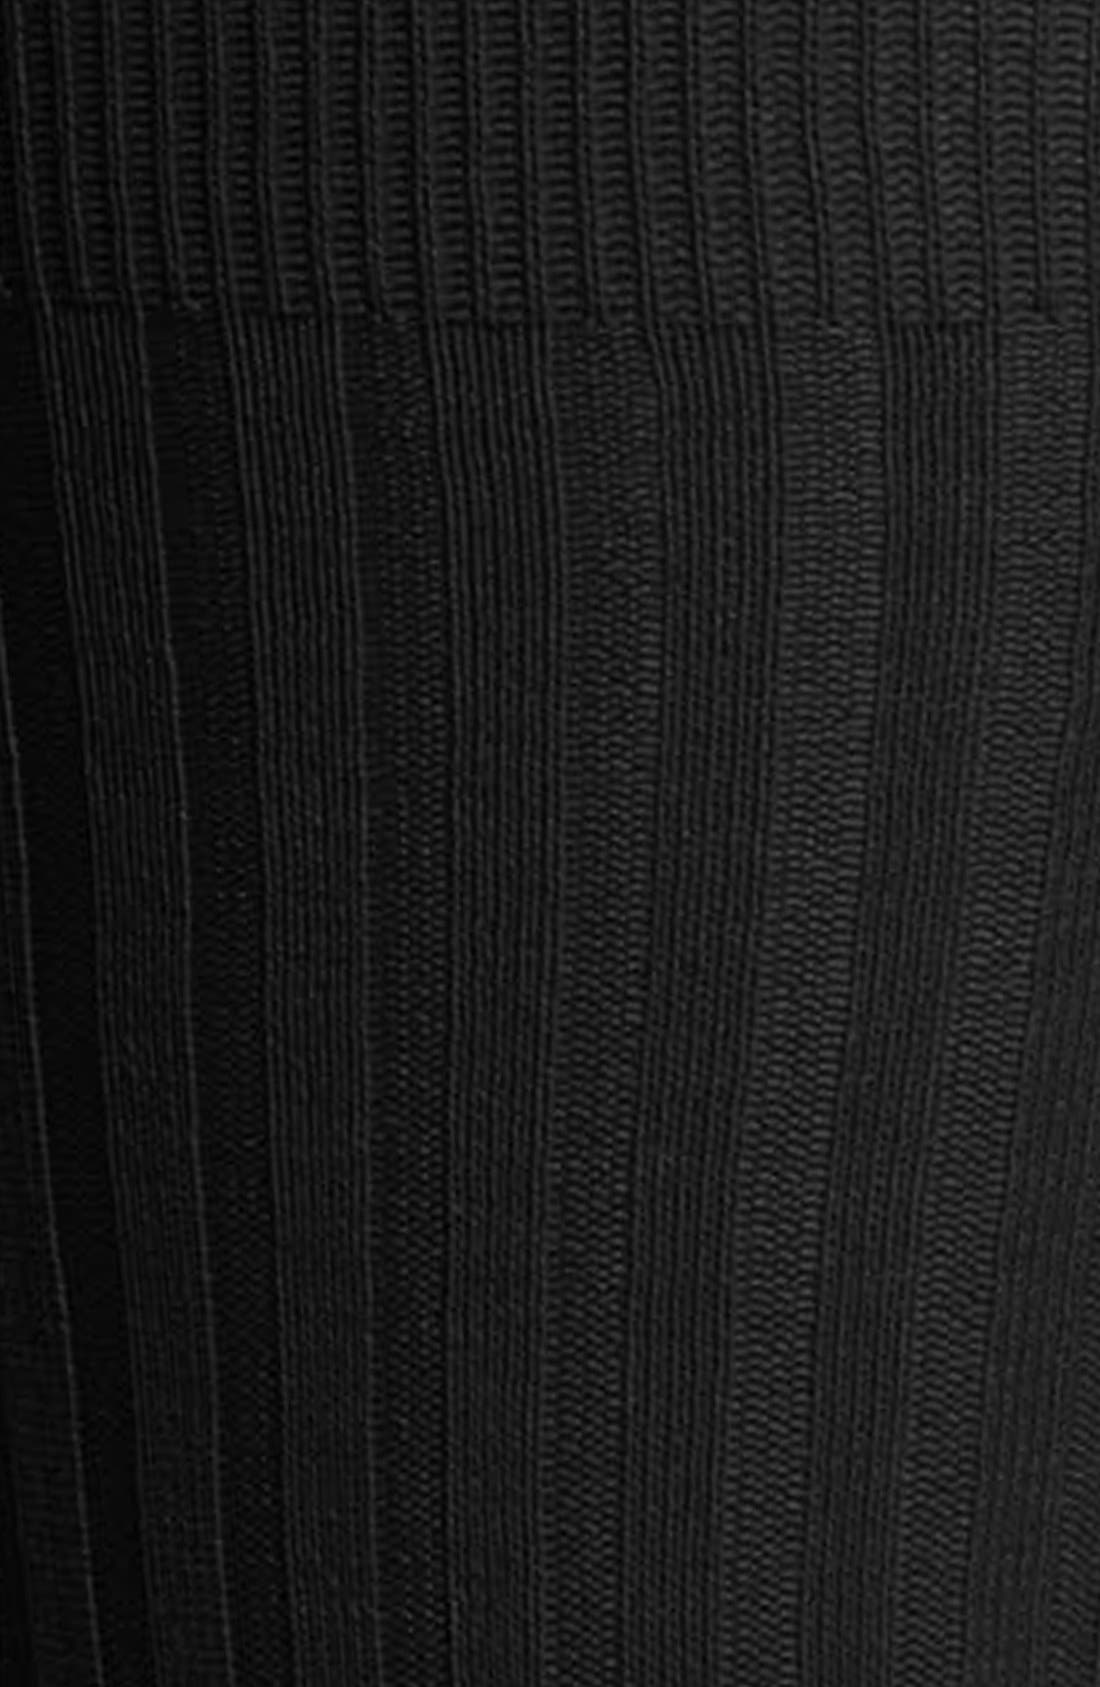 Alternate Image 2  - Pantherella Cotton Blend Mid Calf Dress Socks